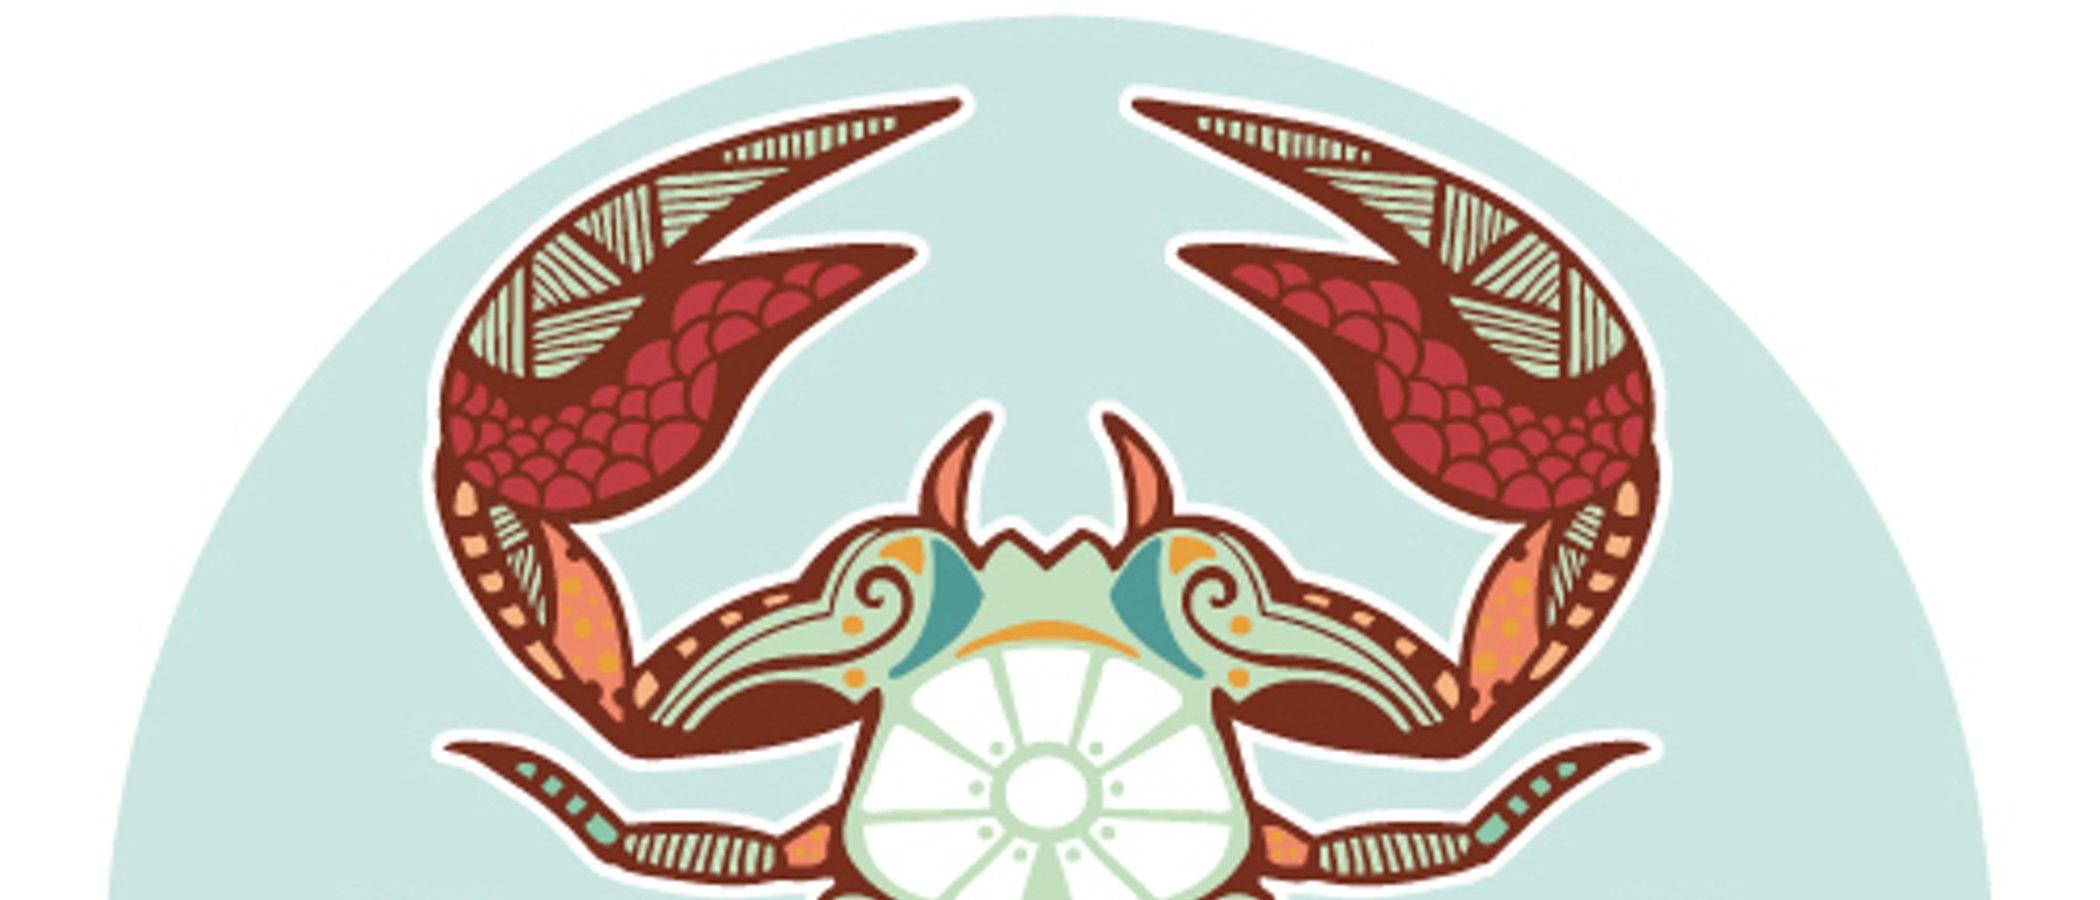 Horóscopo enero 2020: Escorpio